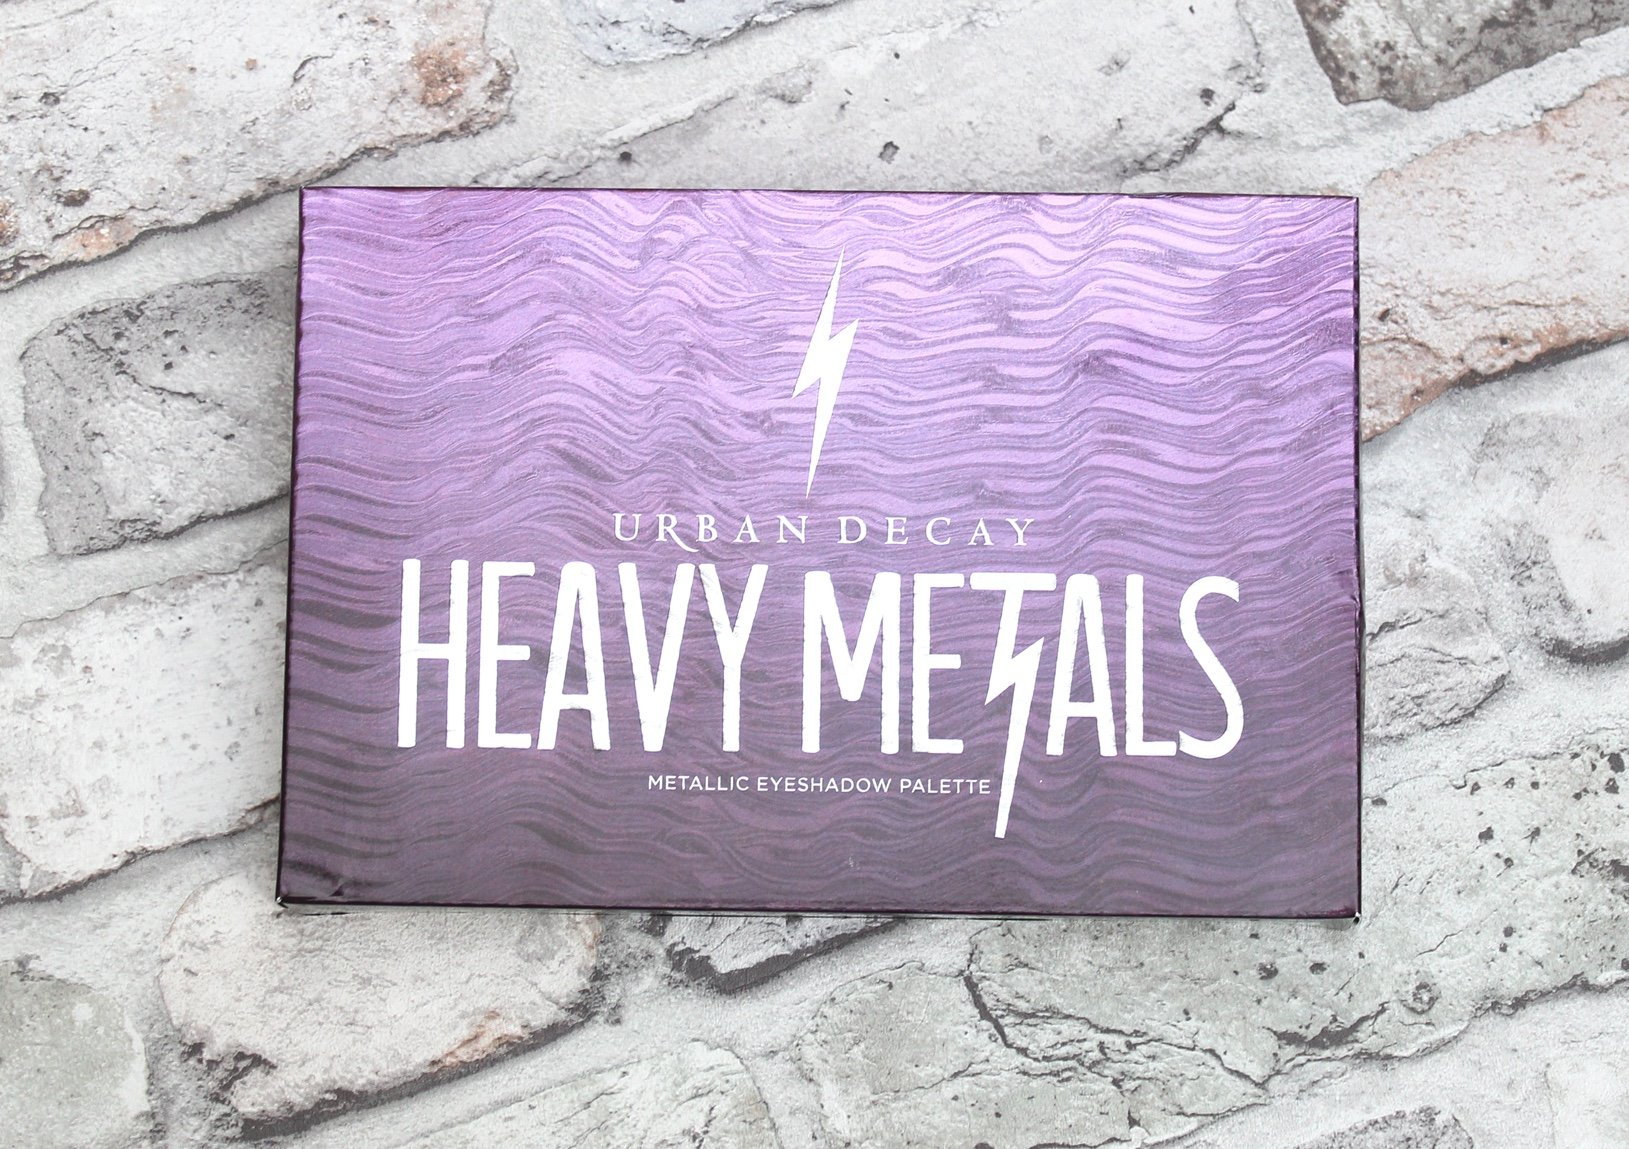 Urban Decay Heavy Metals Metallic Eyeshadow Palette